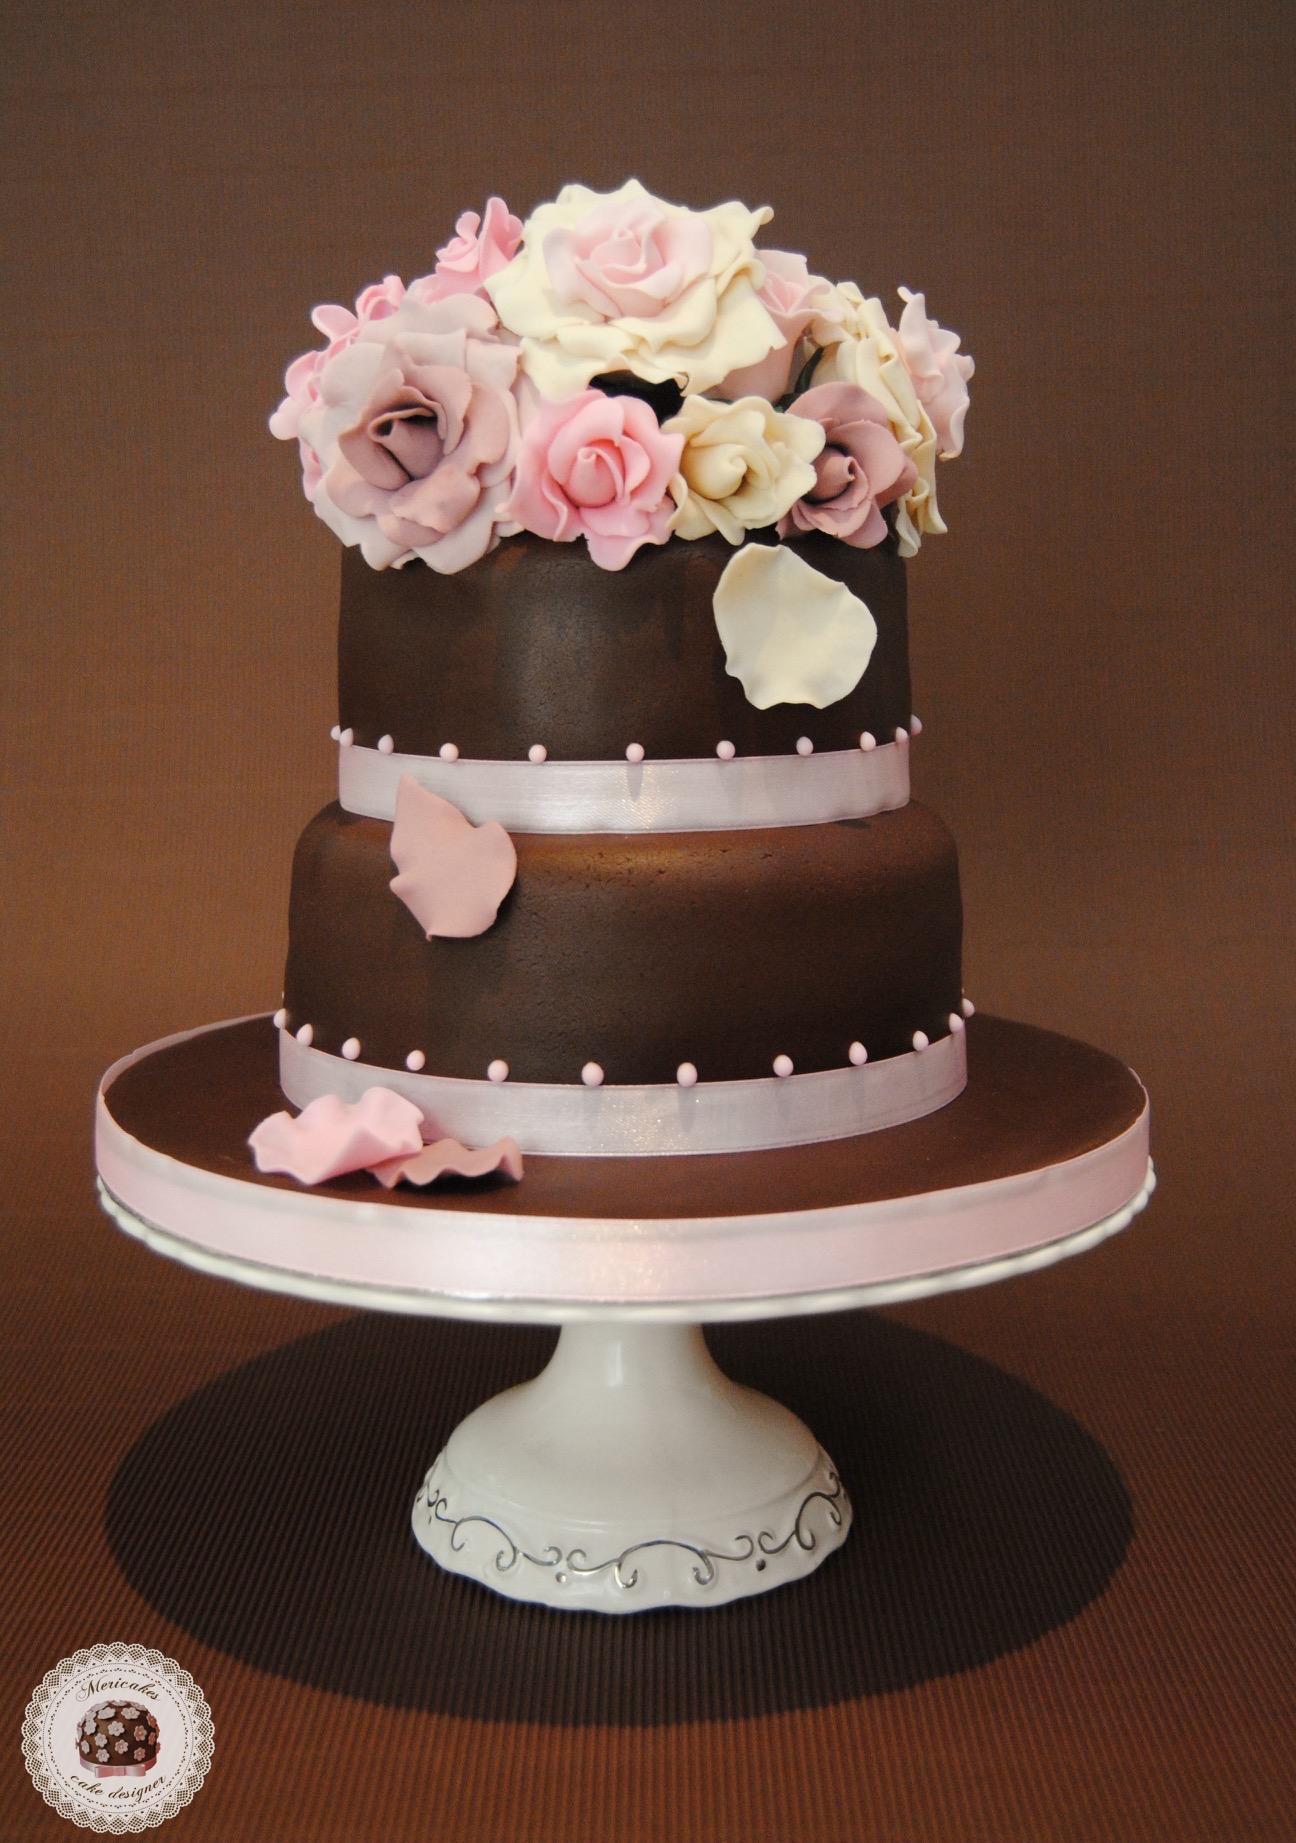 tarta-boda-wedding-cake-mericakes-barcelona-novios-fondant-rosas-chocolate-red-velvet-bouquet